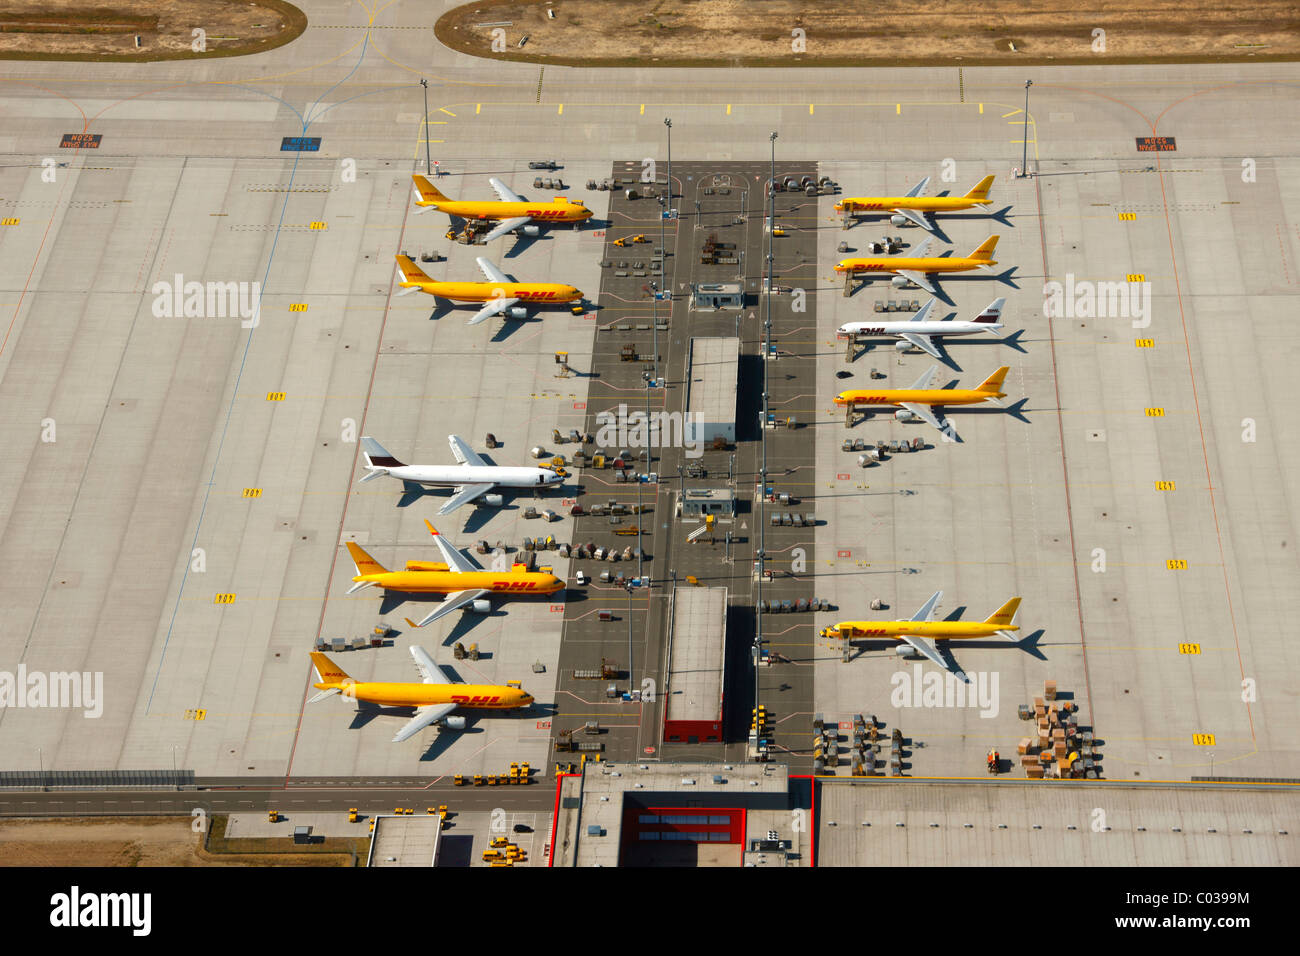 Aerial view, Leipzig International Airport, cargo airport, Schkeuditz, Saxony, Germany, Europe Stock Photo